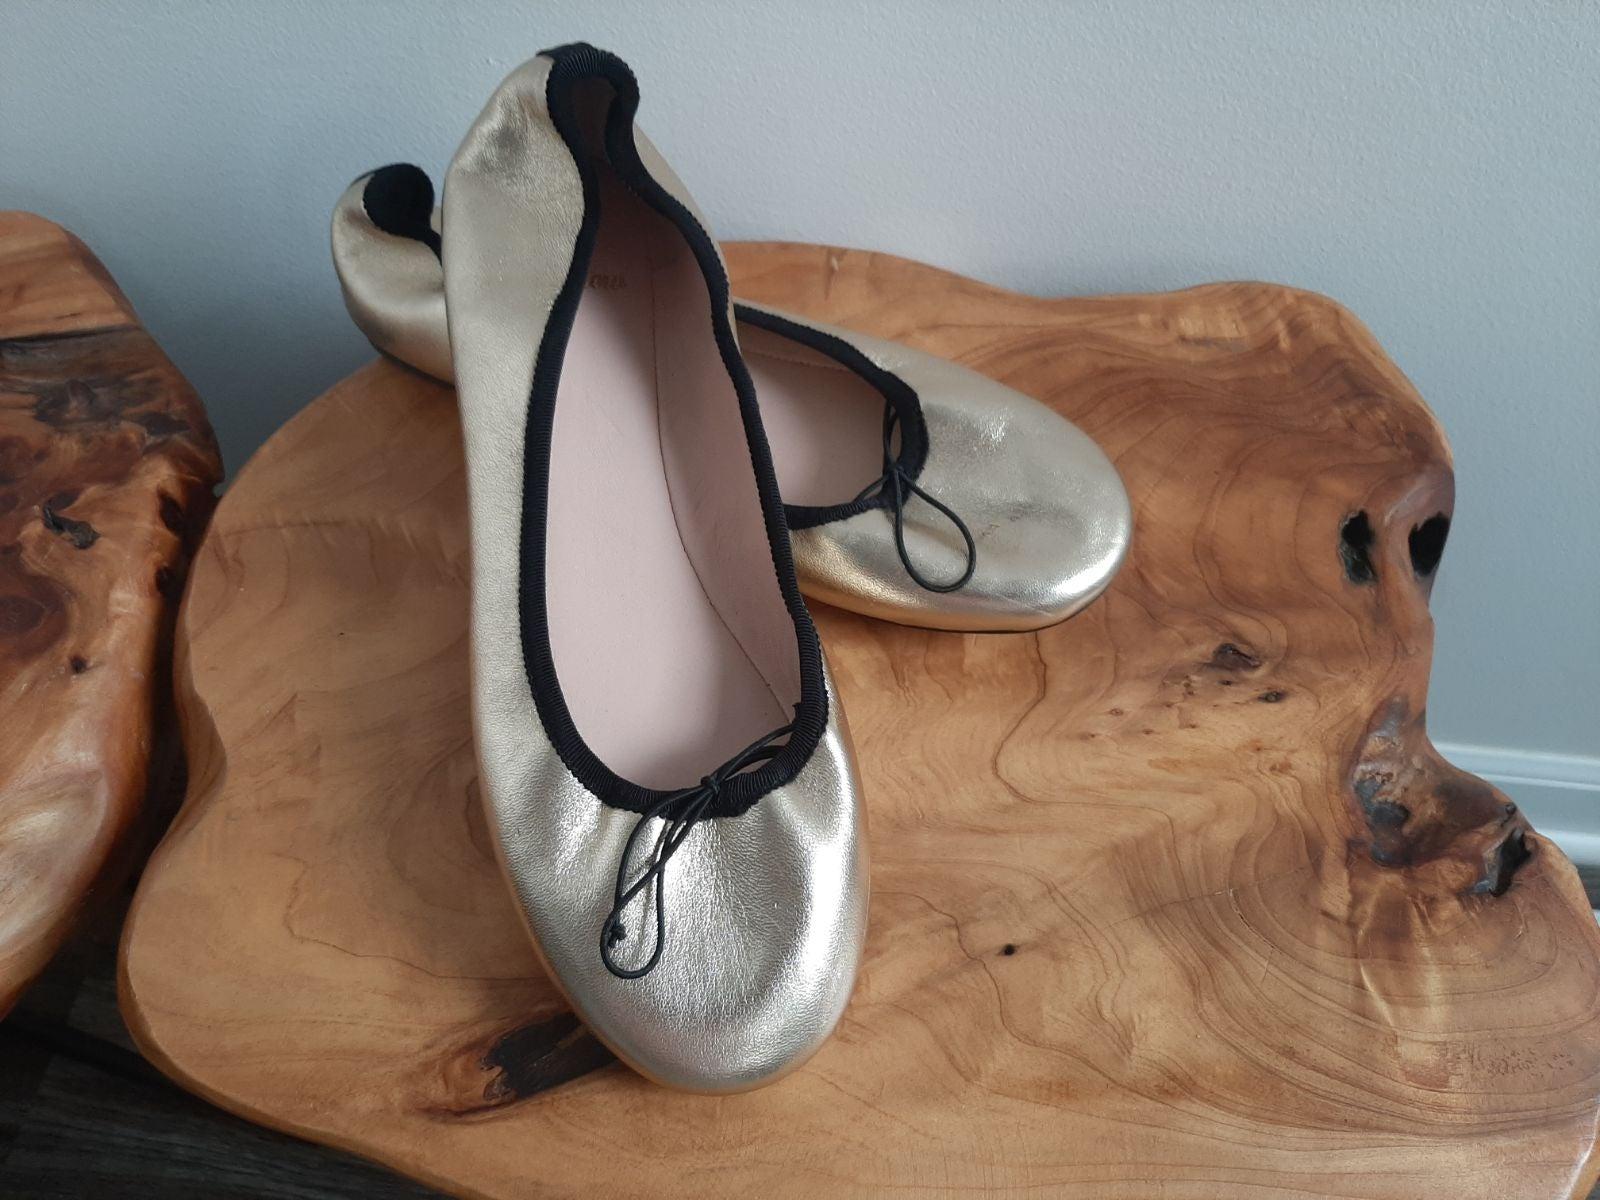 J.Crew Ballerina Flats size 6.5